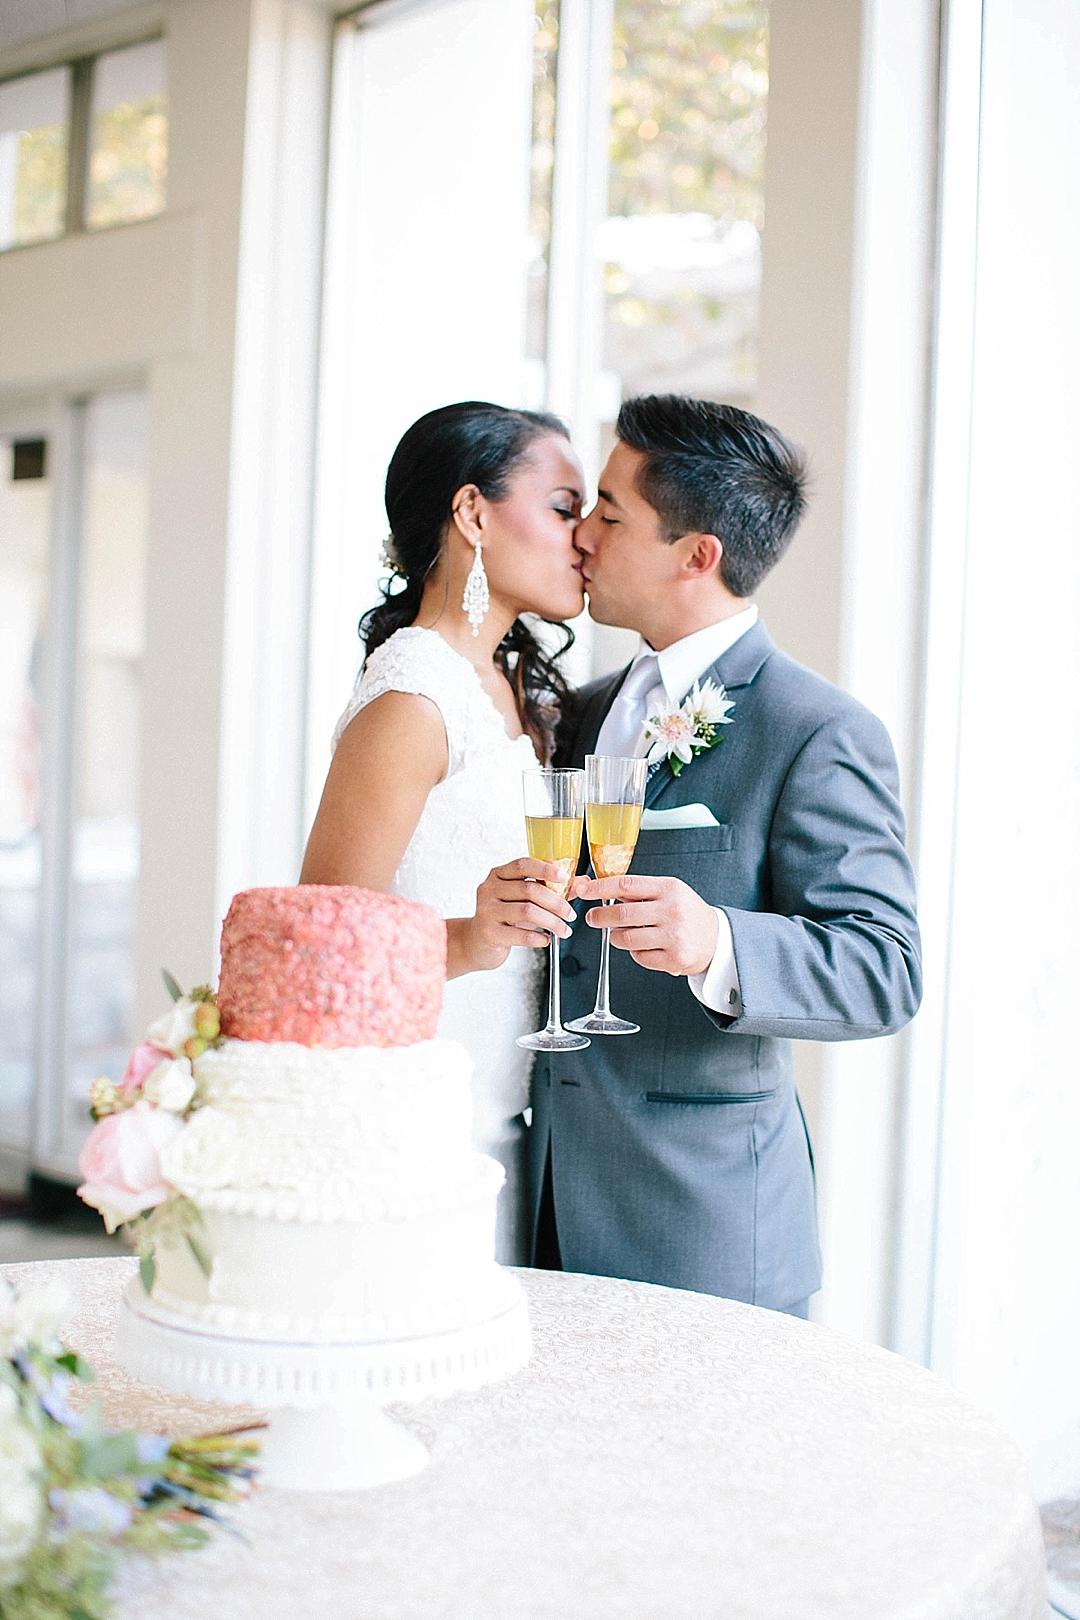 davids bridal for aisle society - couple